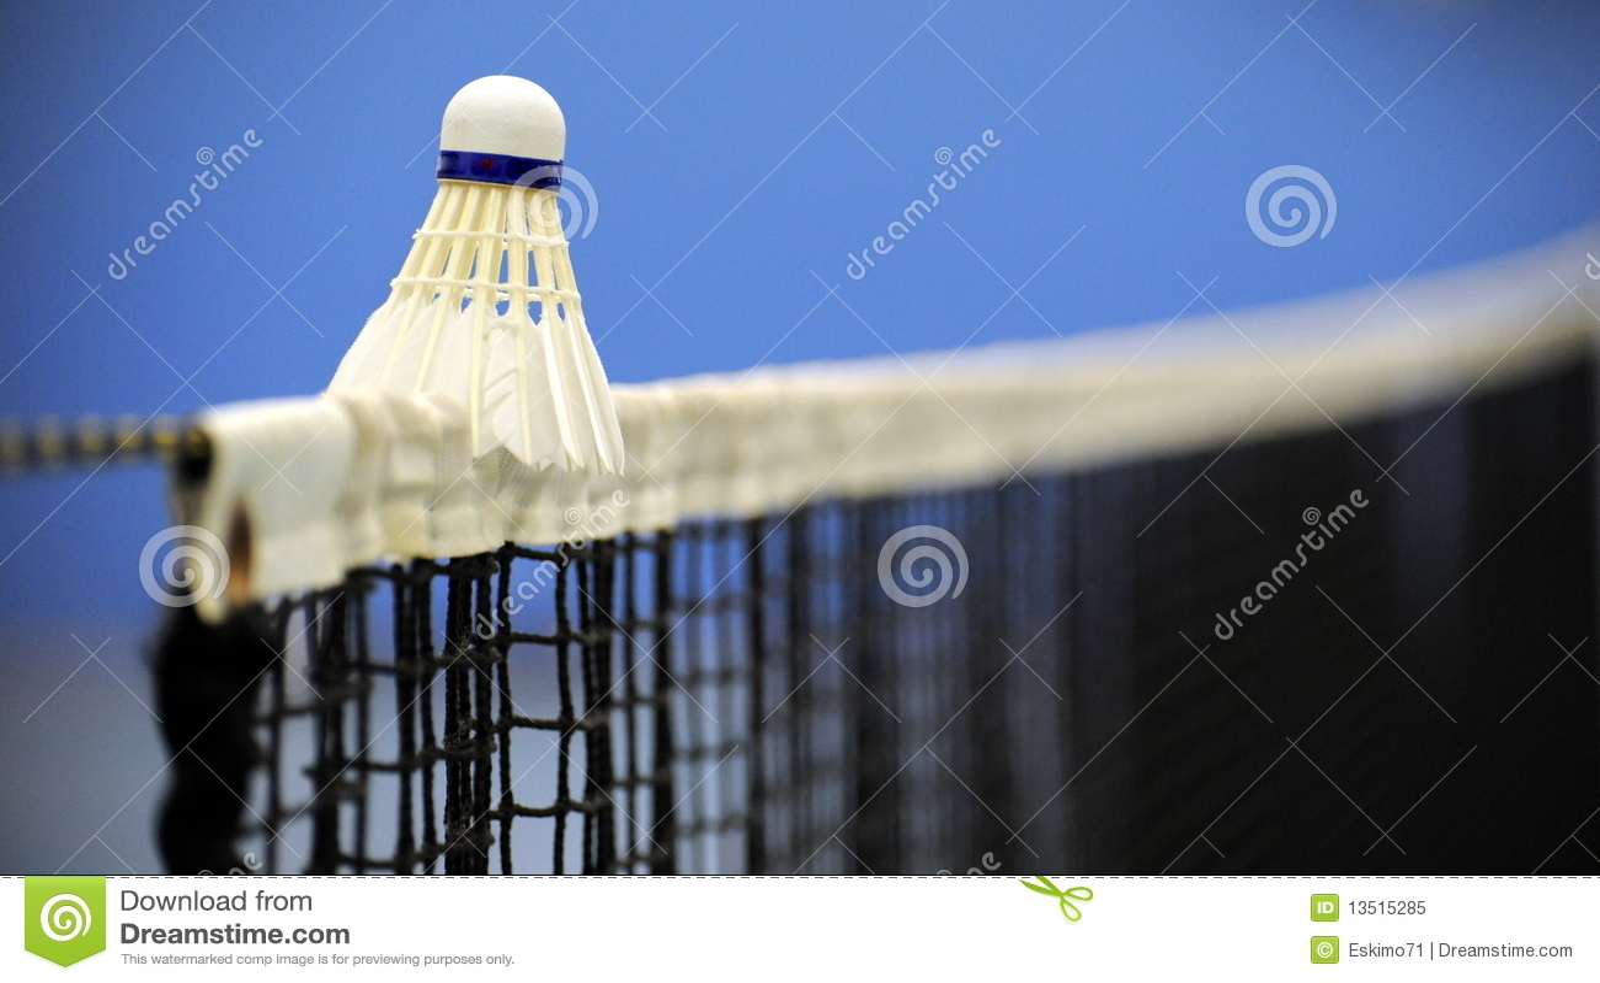 Badminton on net